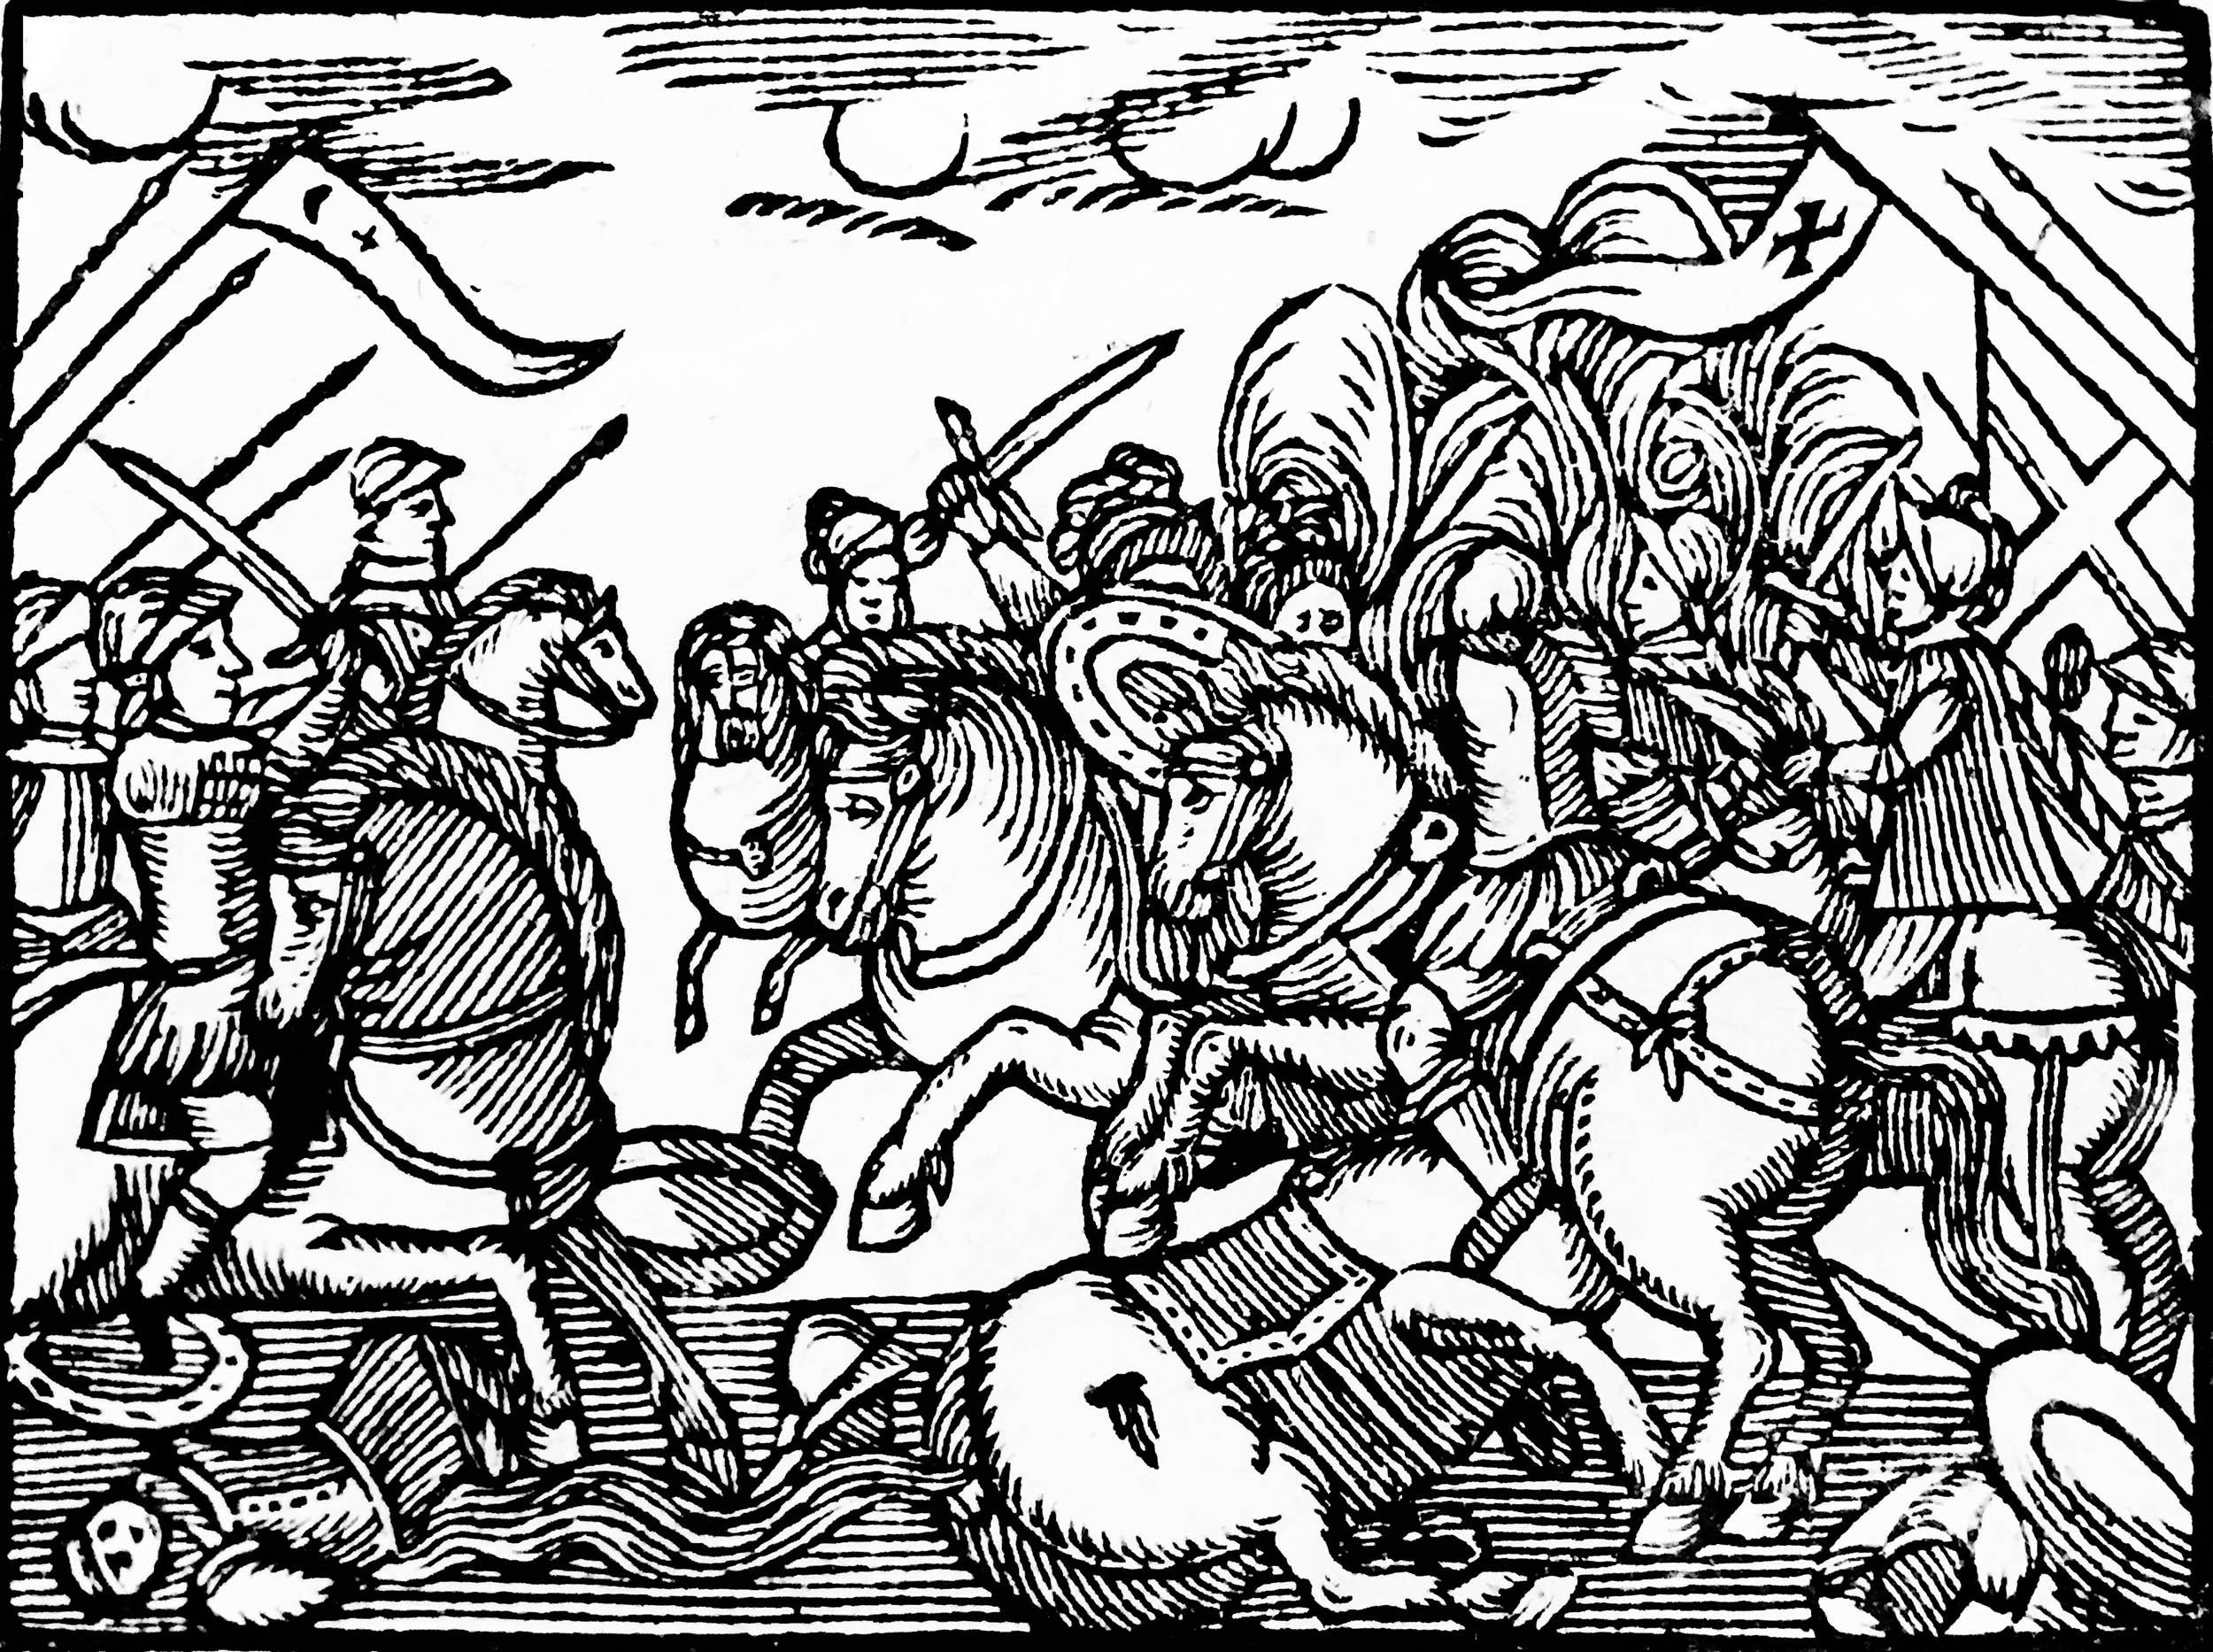 image=gravures coloriage gravure chevaliers 1620 1